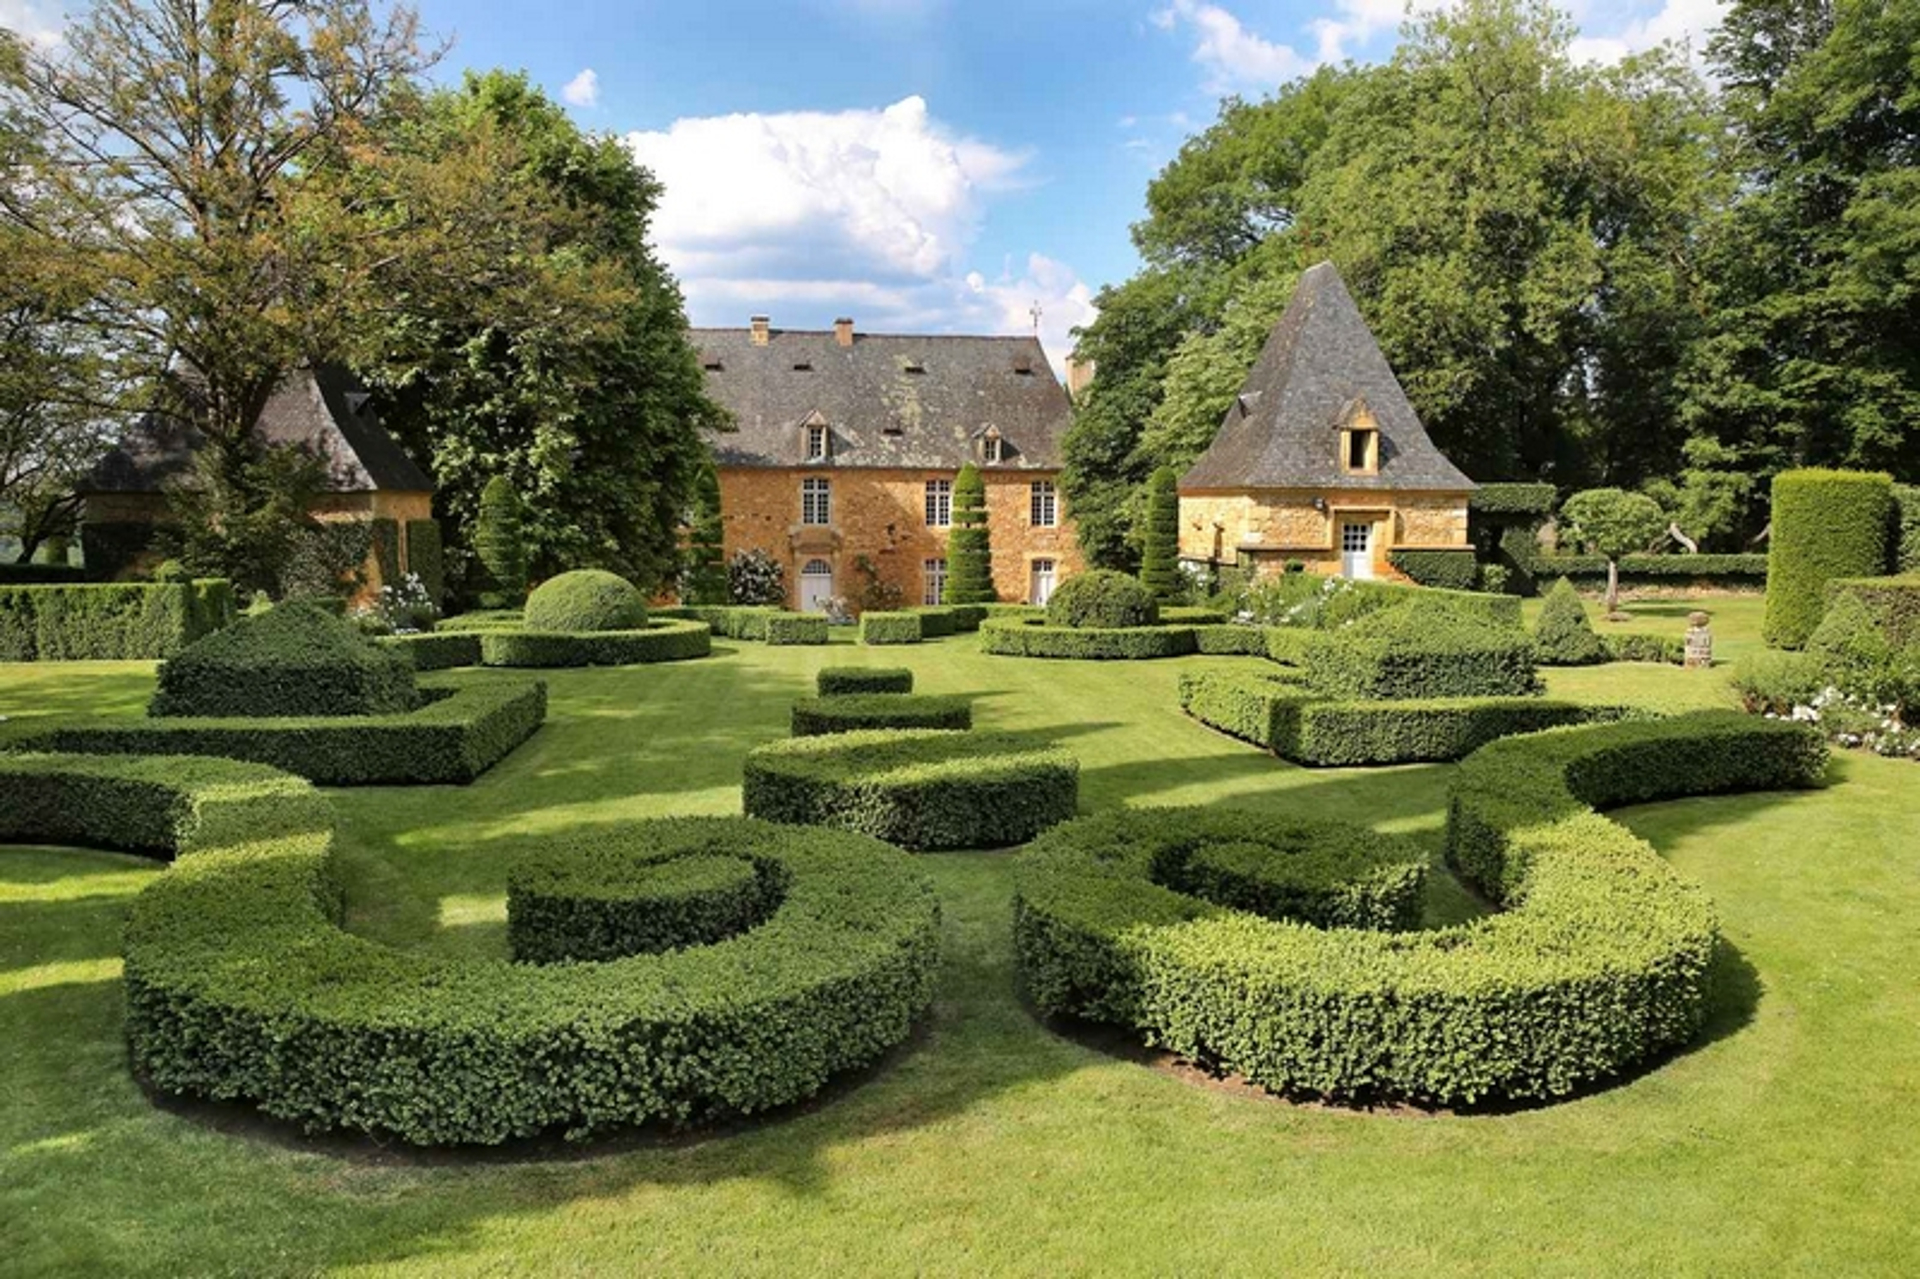 Jardin-eyrignac-perigord-eyrignac gardens